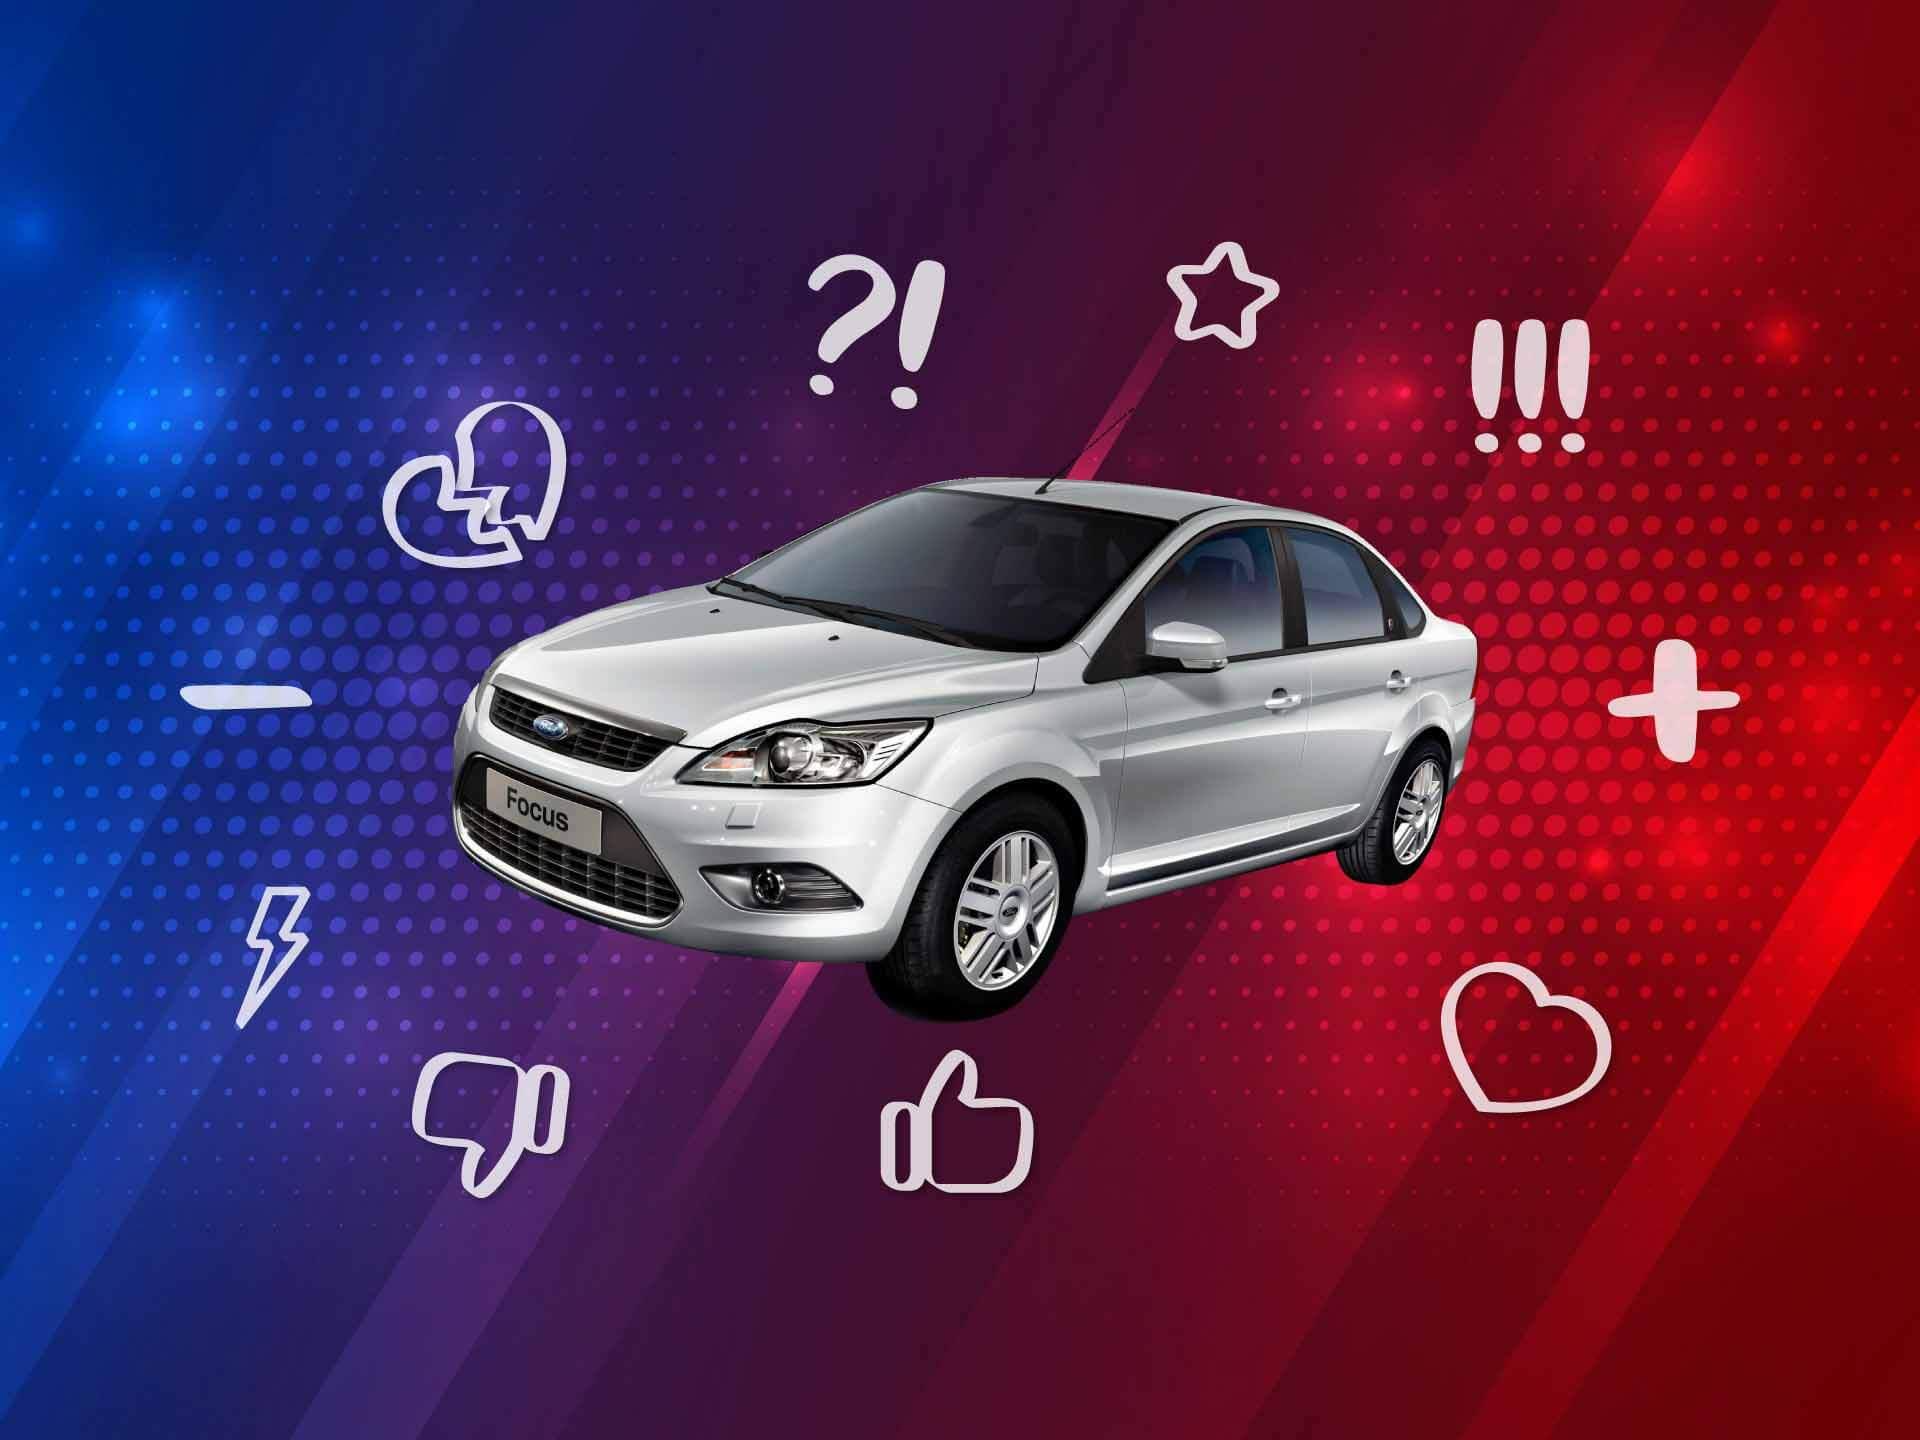 Ford Focus ll: отзывы, плюсы, минусы